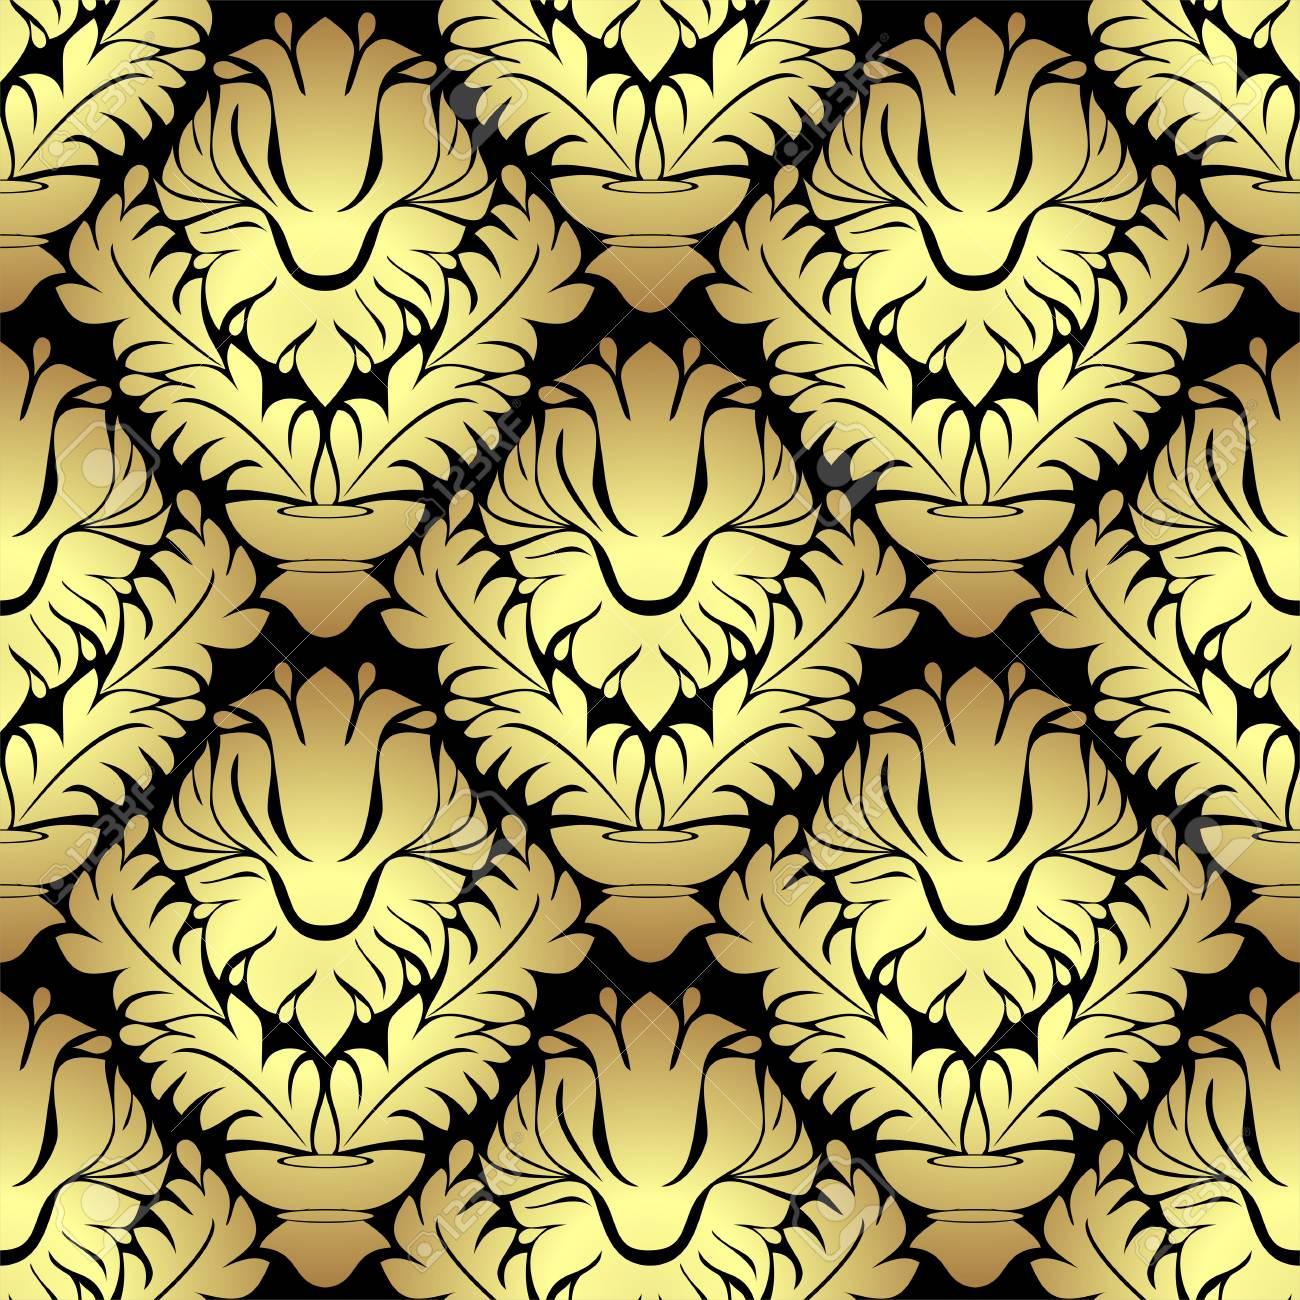 Ornamental golden damask seamless Pattern on black - 97509759